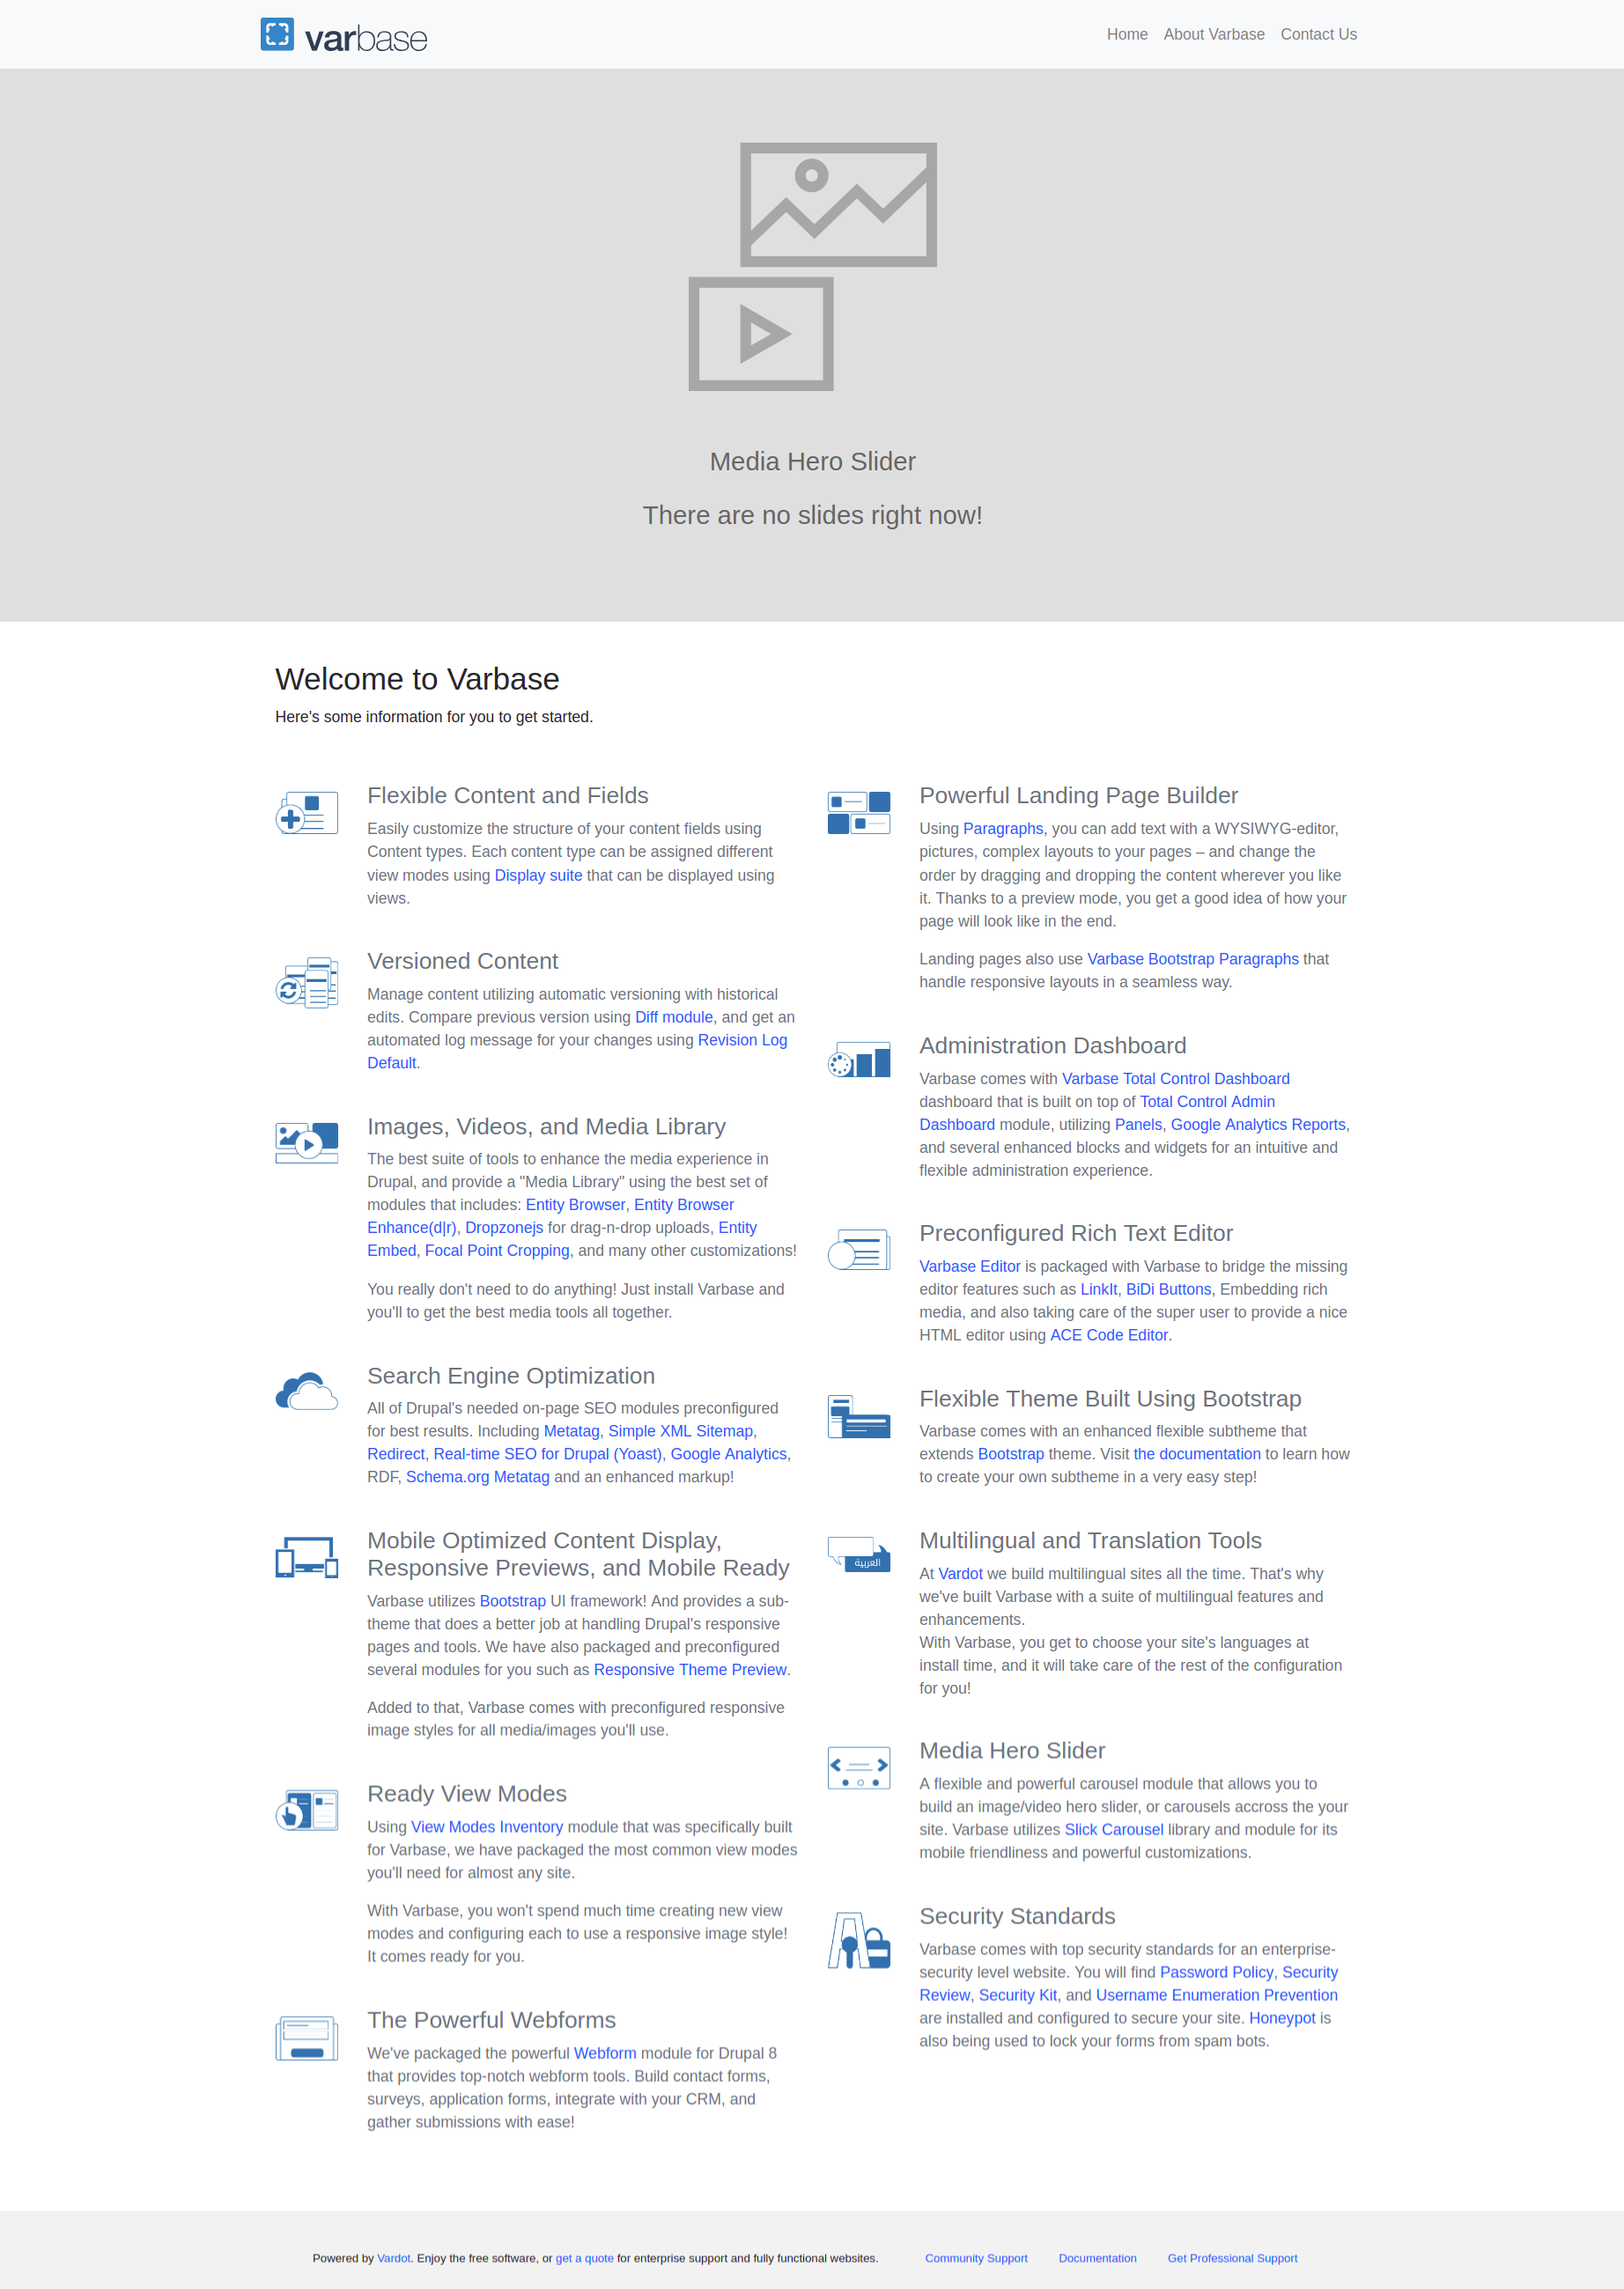 Varbase Theme (Bootstrap 4 - SASS) | Drupal org